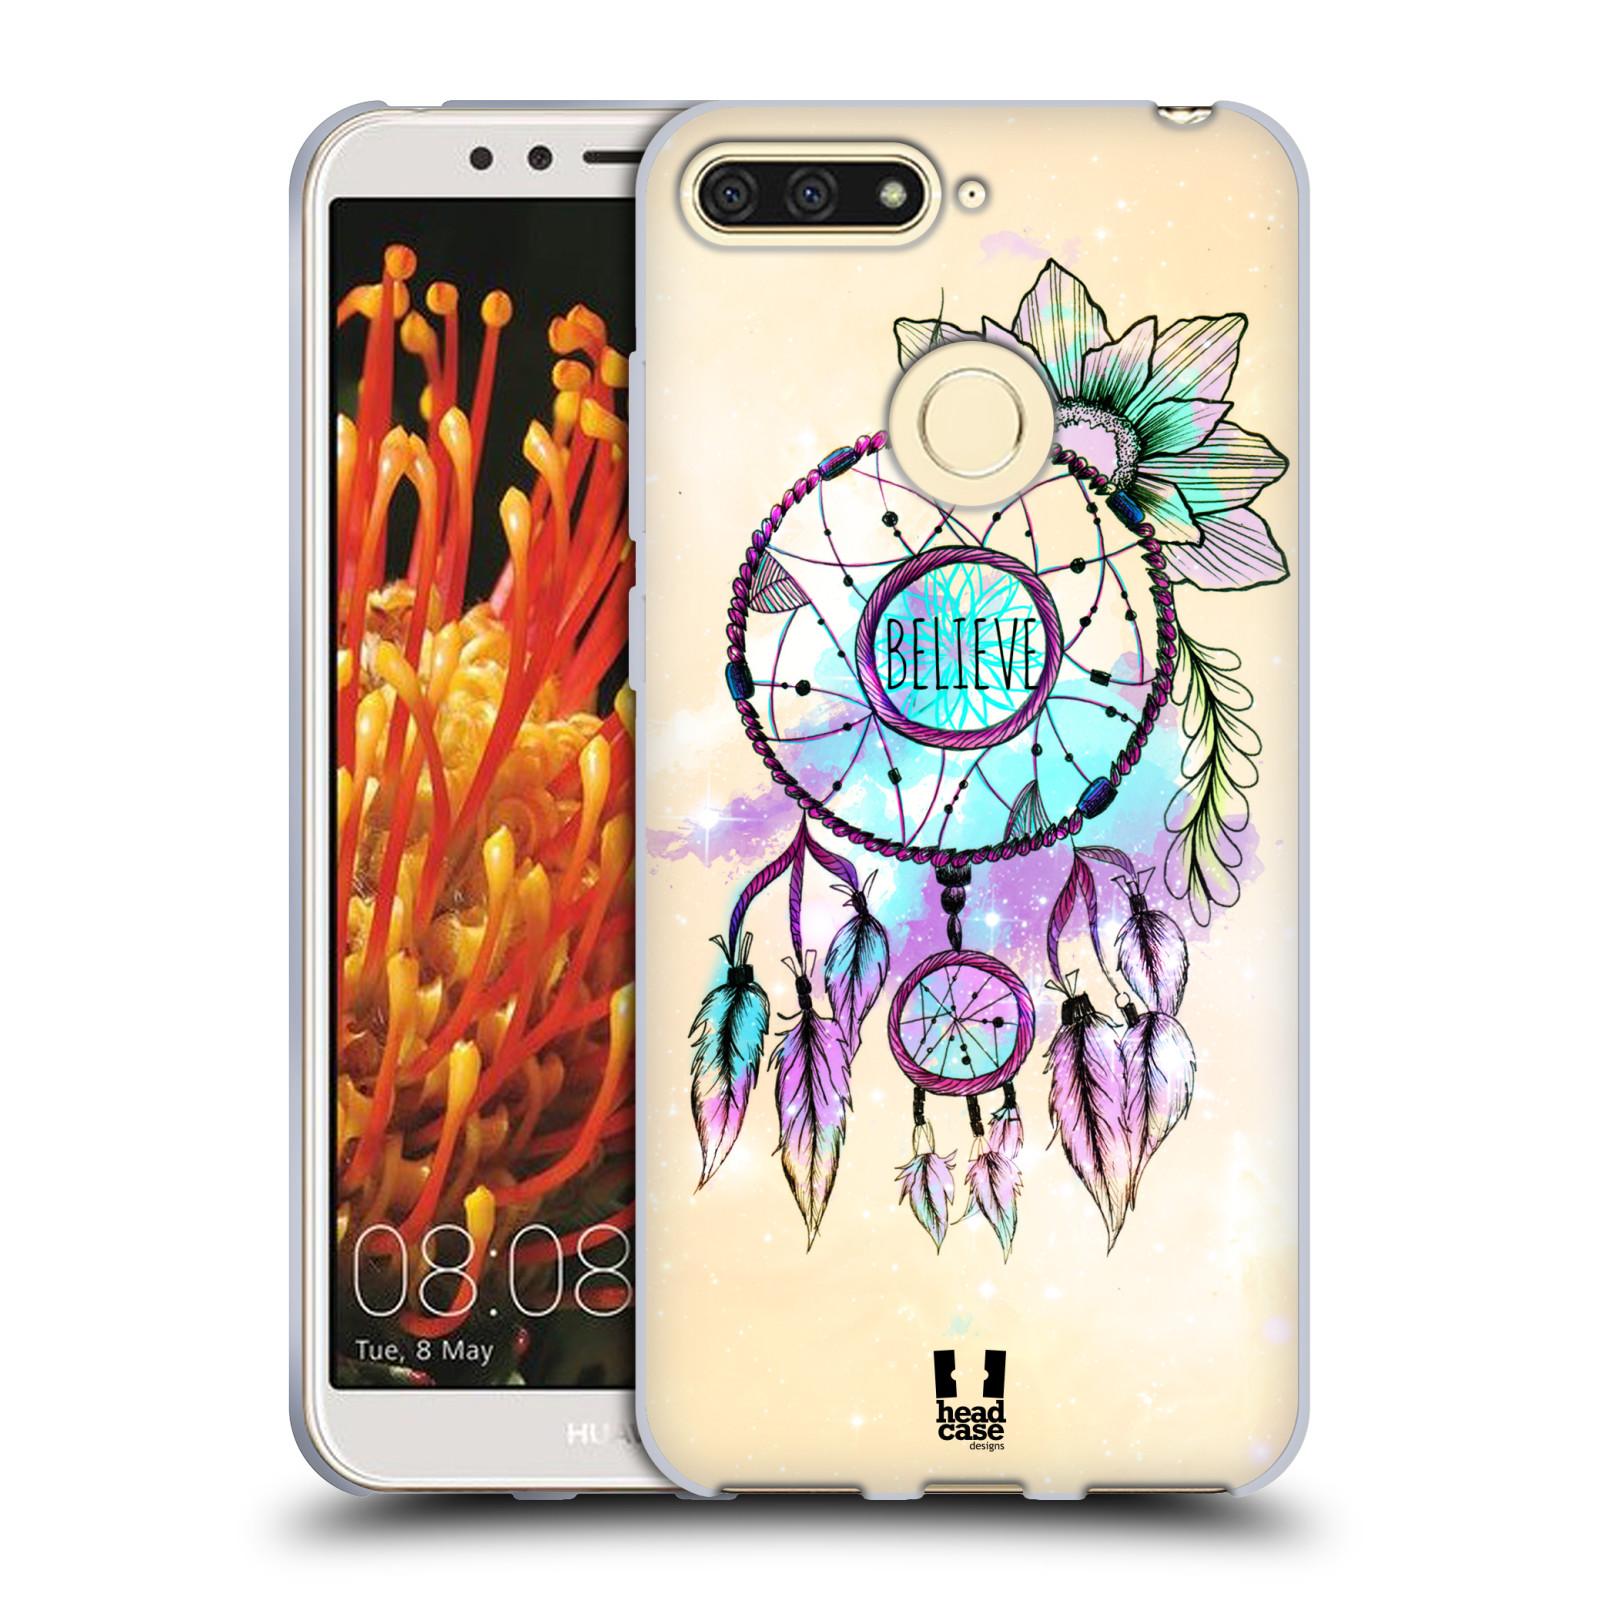 Silikonové pouzdro na mobil Huawei Y6 Prime (2018) - Head Case - MIX BELIEVE